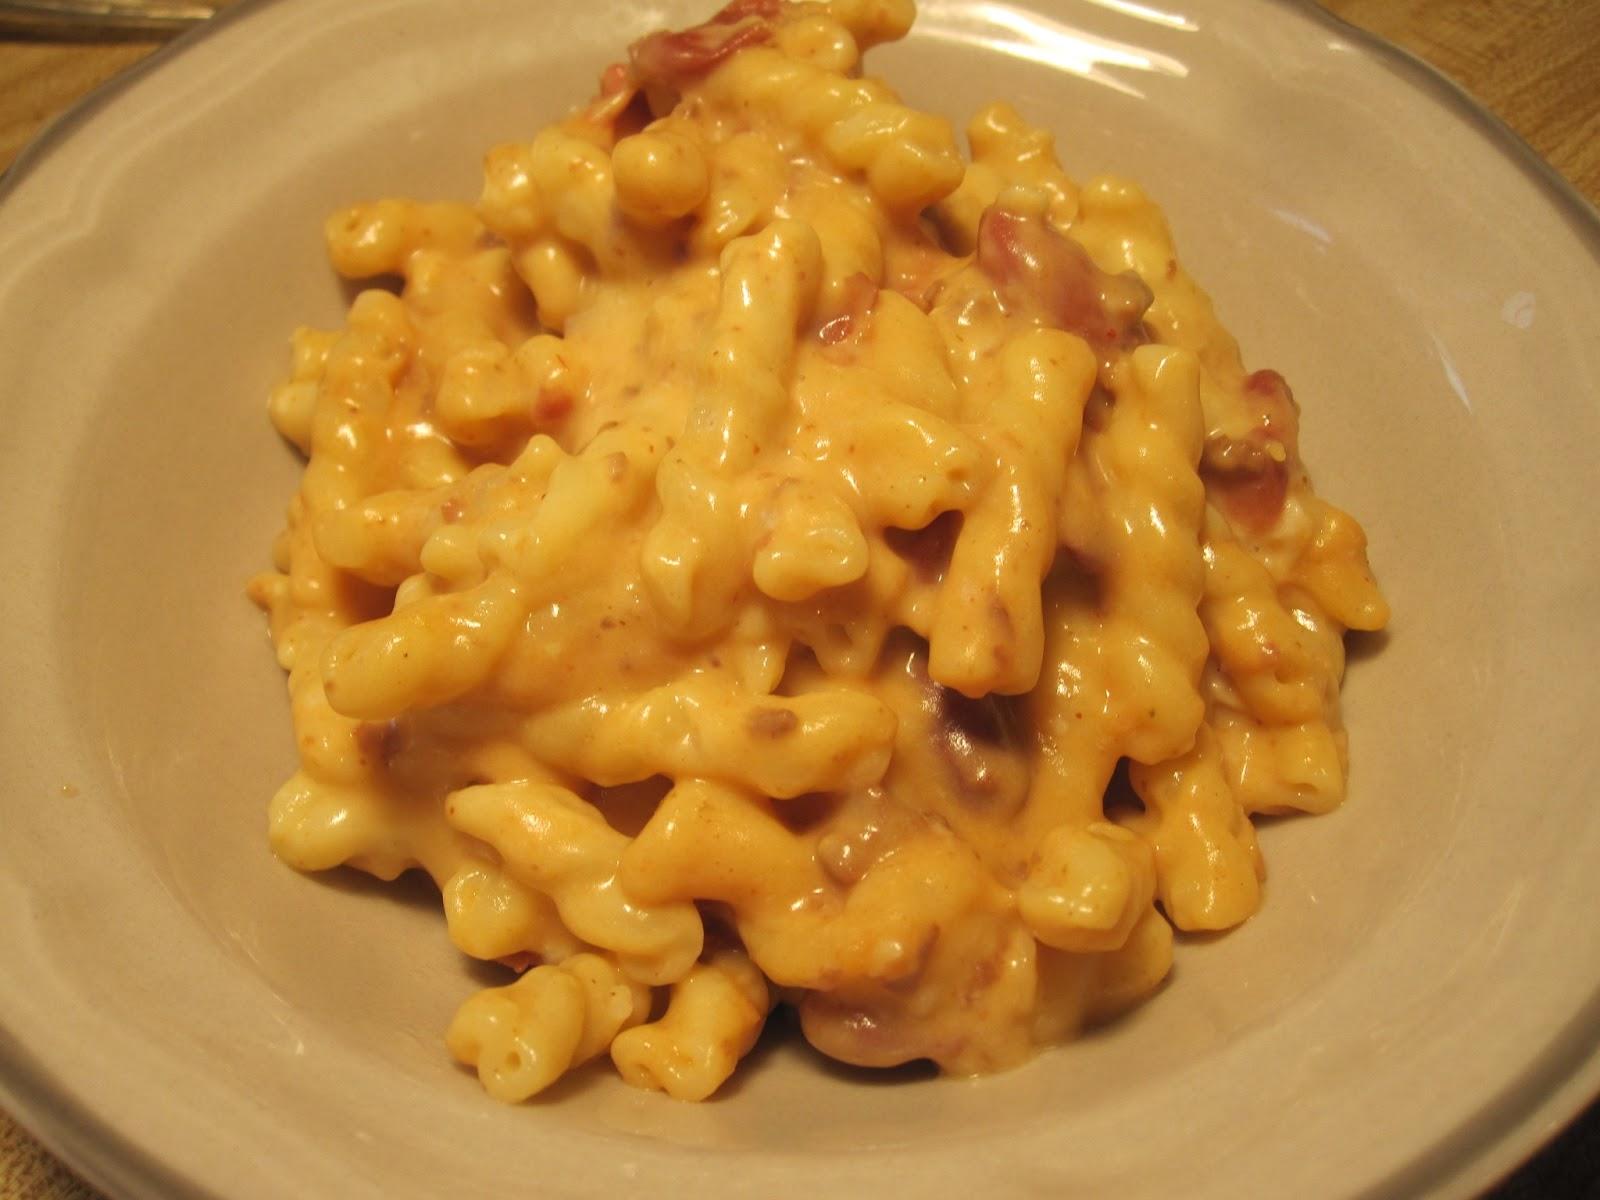 Vegetarian and Cooking!: Chili Mac & Cheese